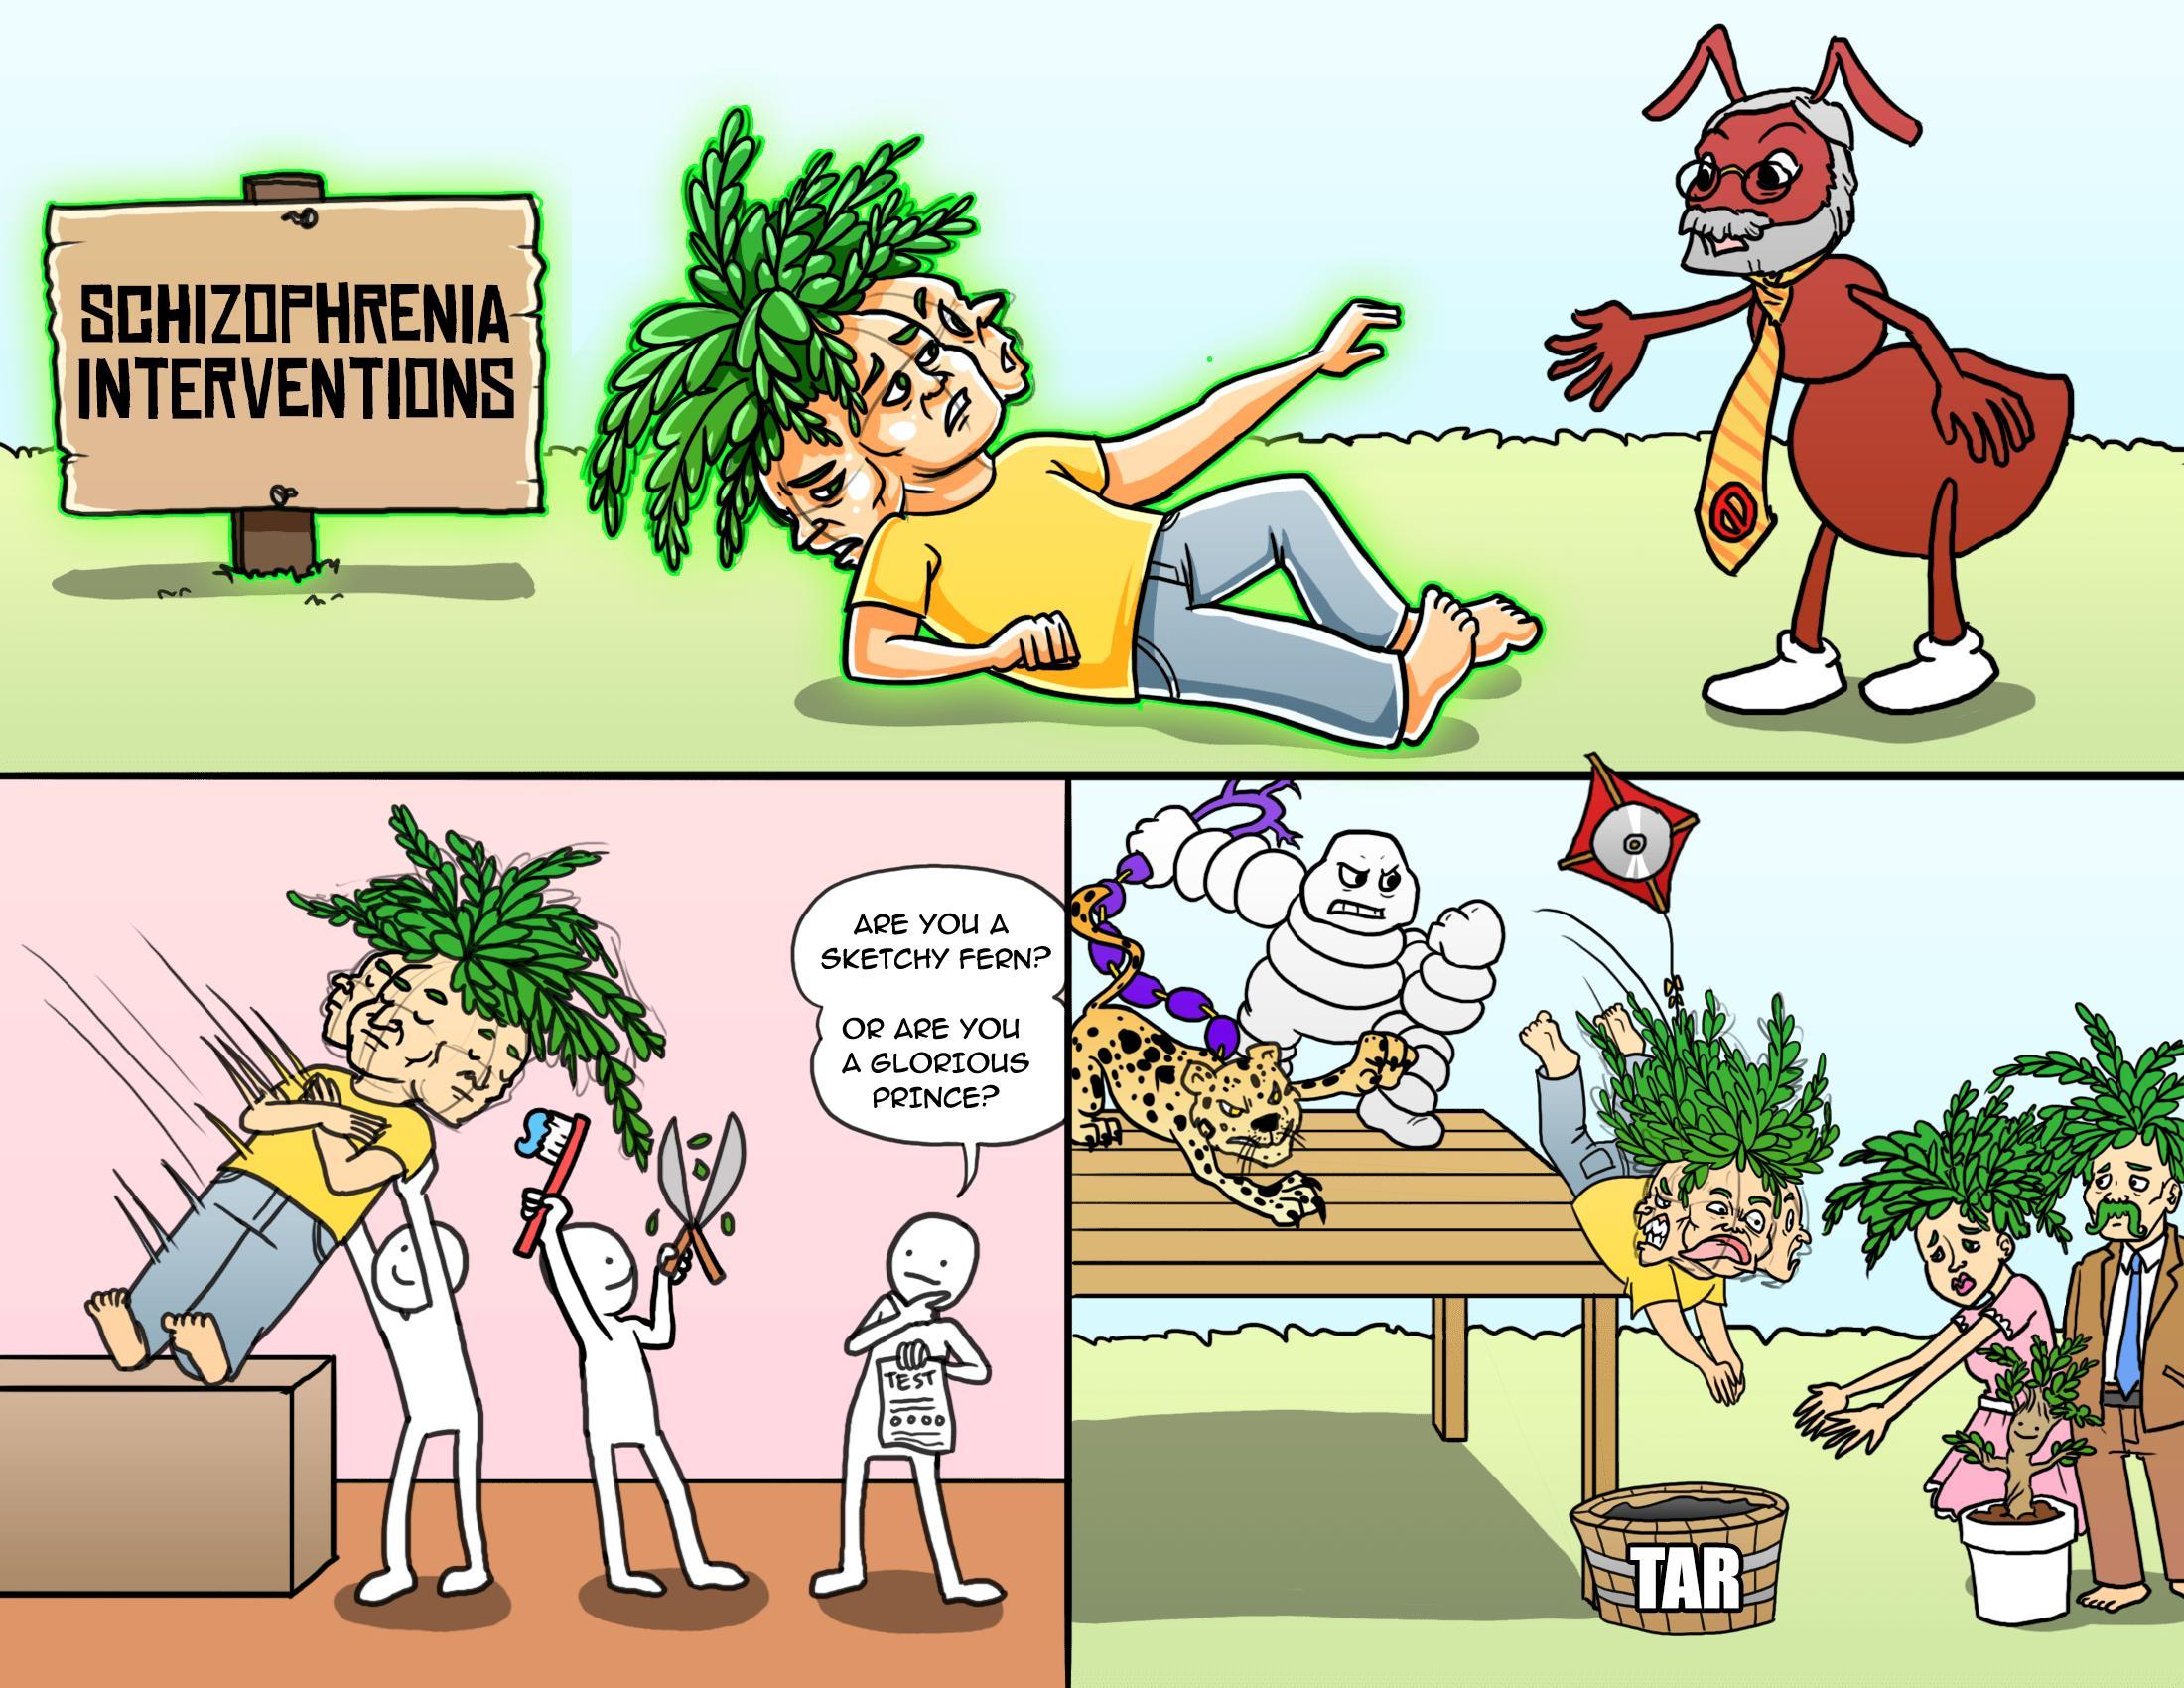 Schizophrenia Interventions